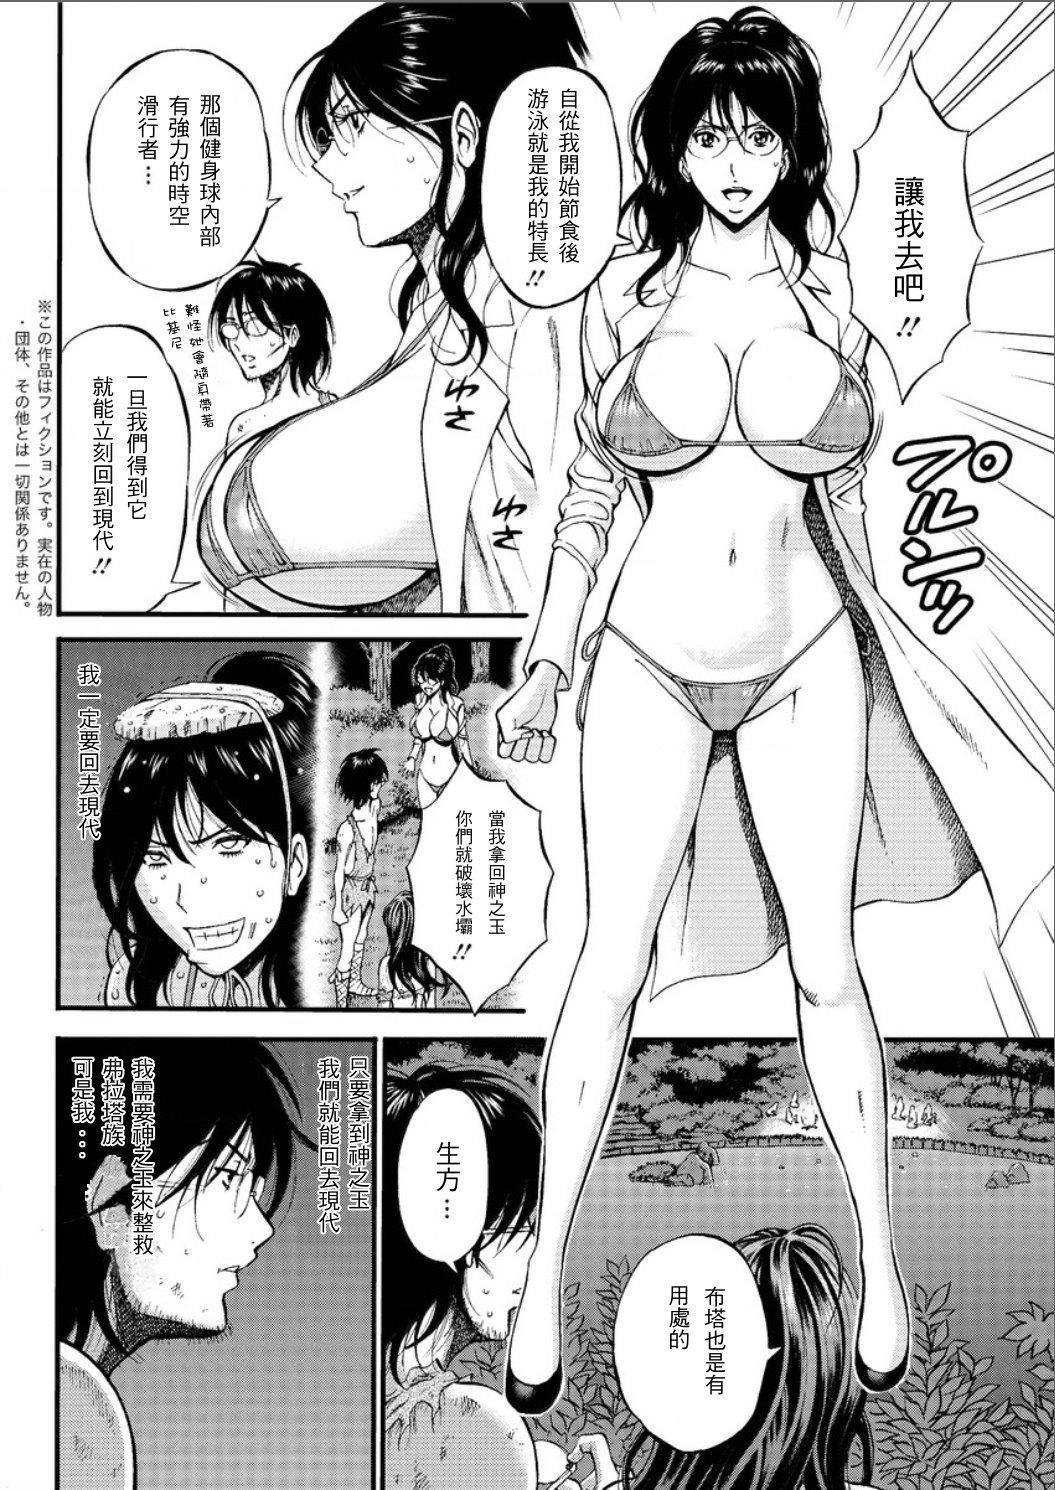 Kigenzen 10000 Nen no Ota | 史前一萬年的宅男 Ch. 19-24 23